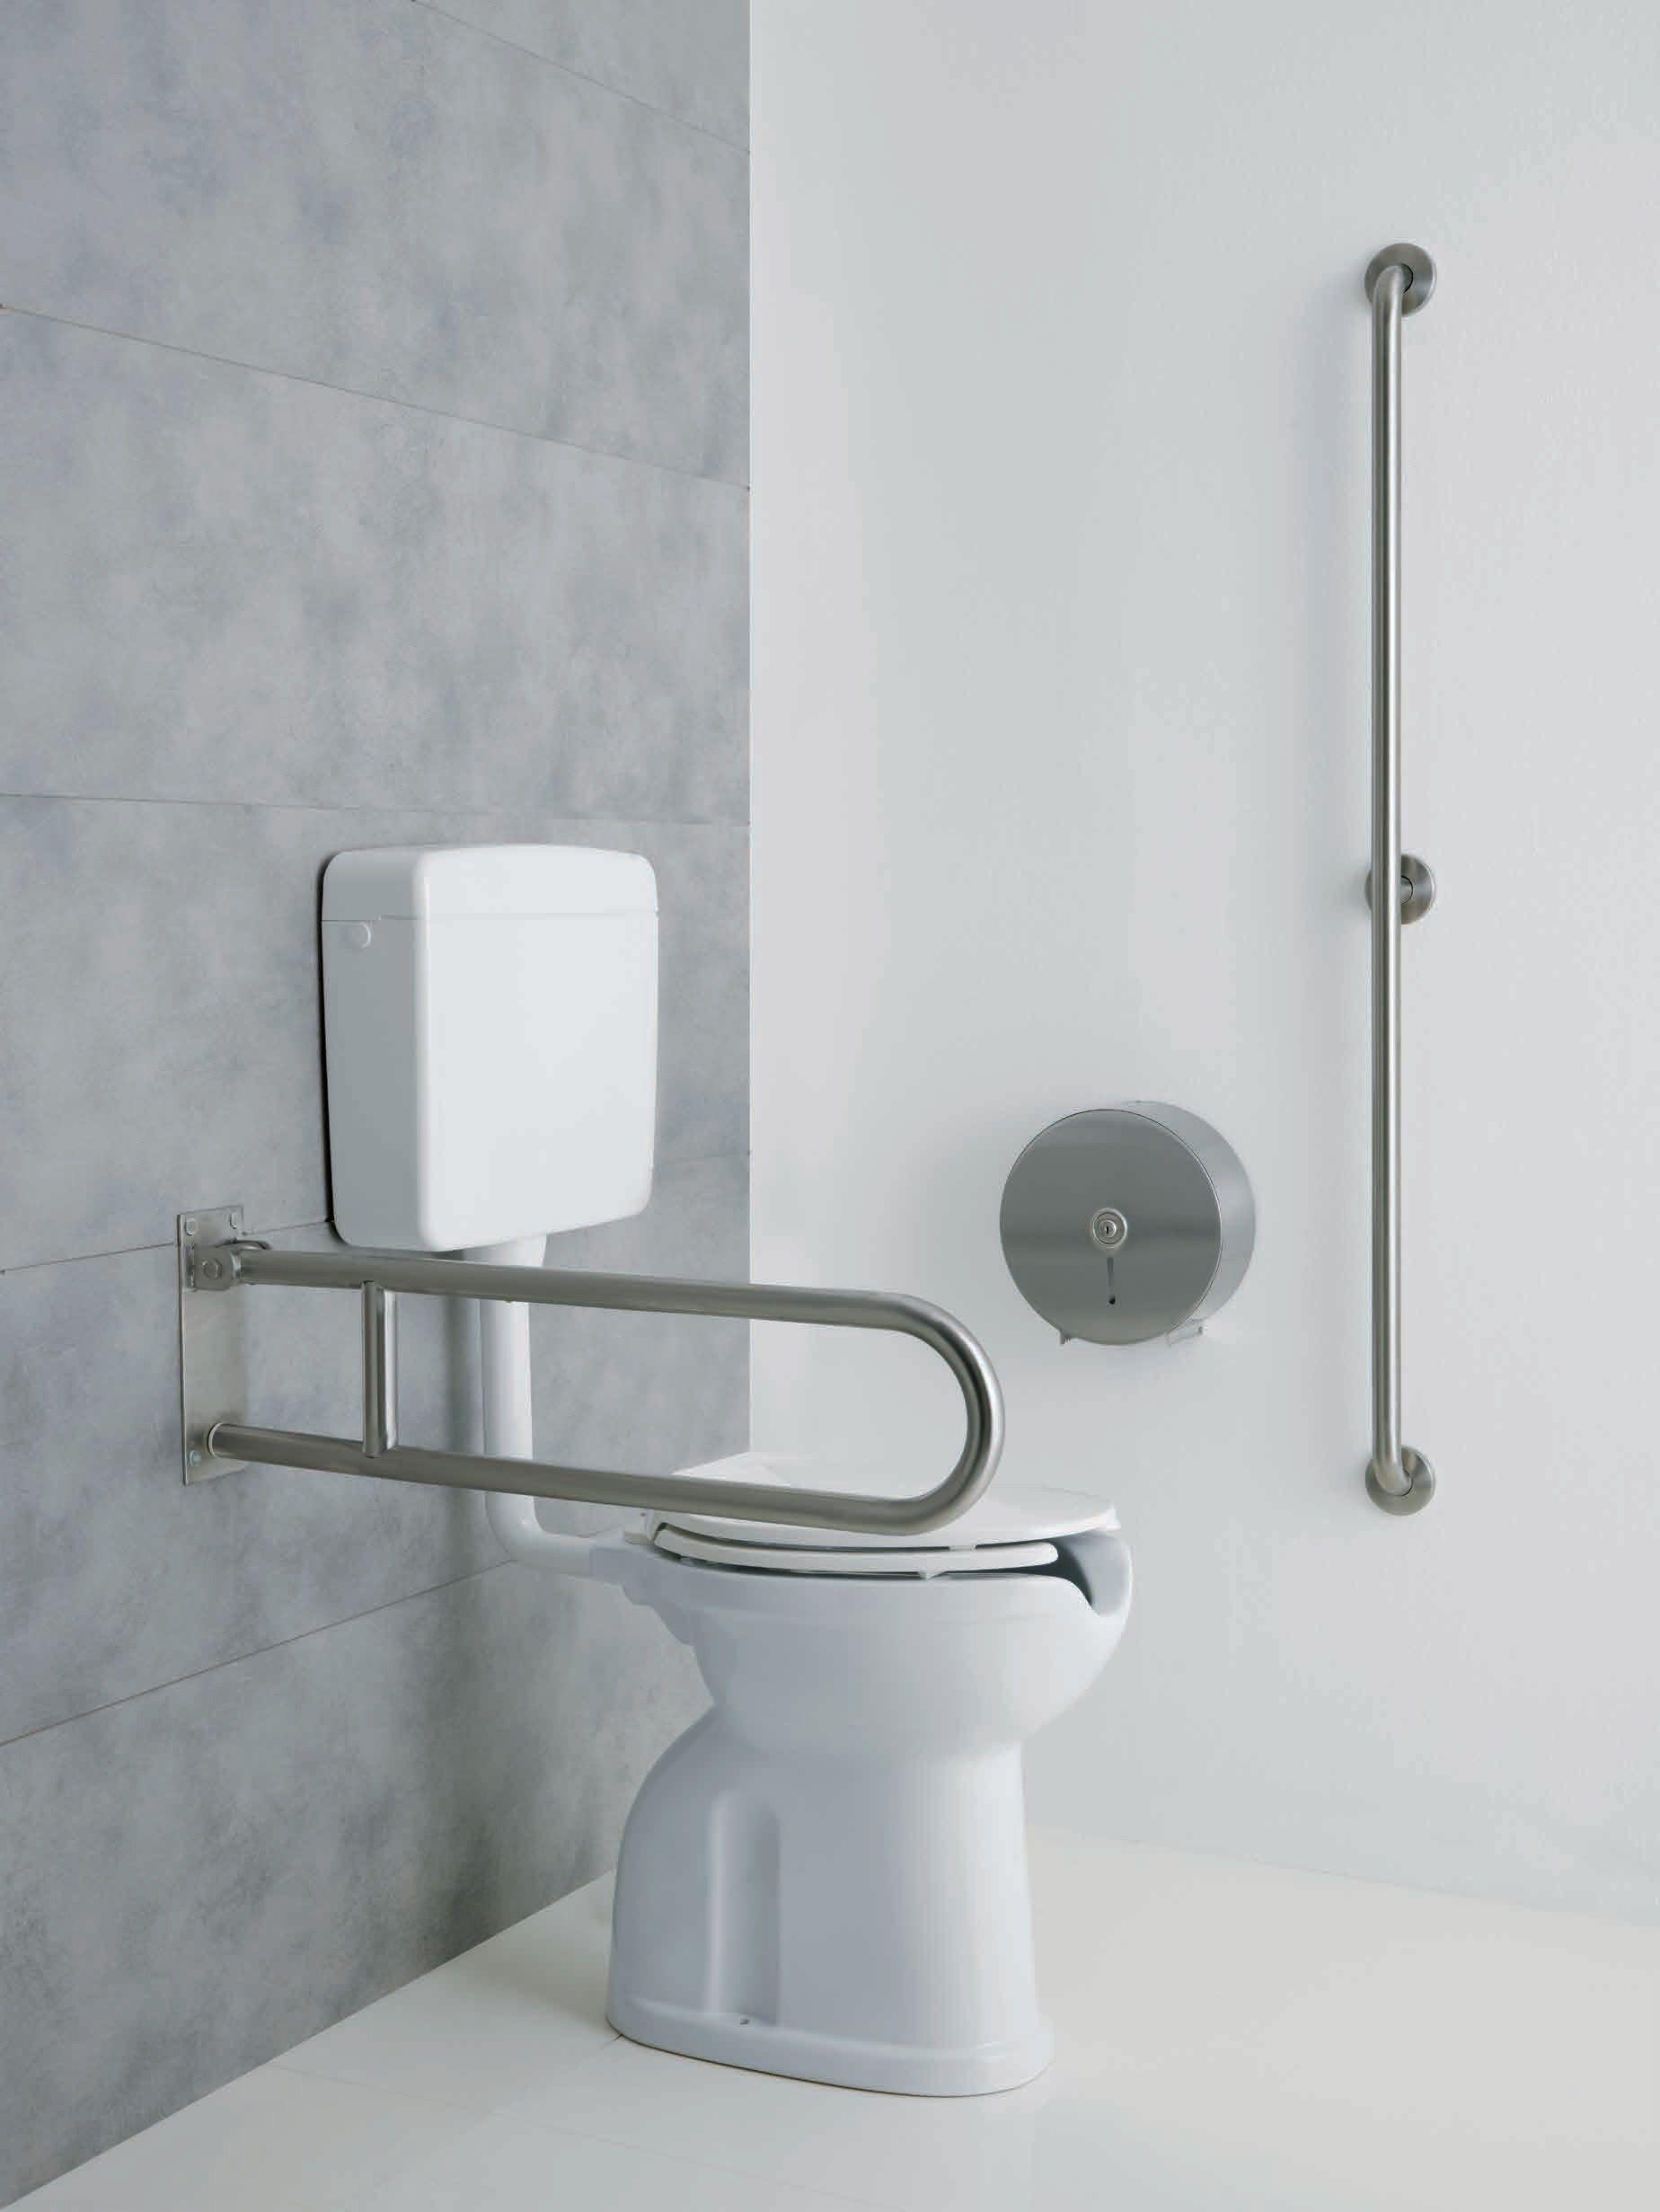 Bagnosicuro acciaio inox satinato folding grab bar by - Grab bars for toilet in bathrooms ...